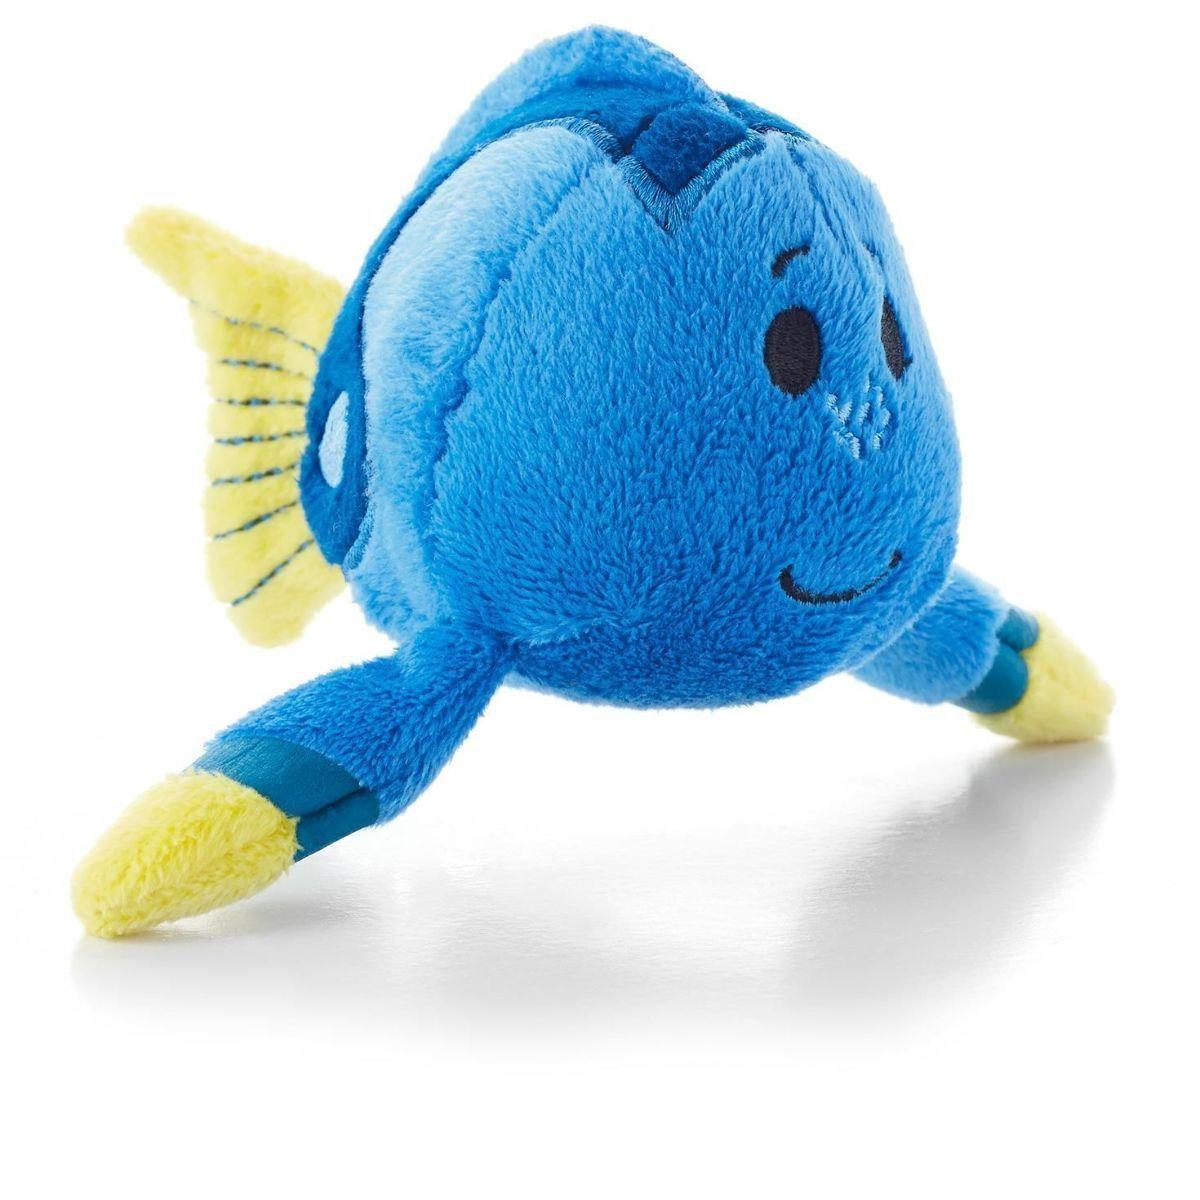 Hallmark Itty Bittys Disney Finding Nemo Dory Plush Products